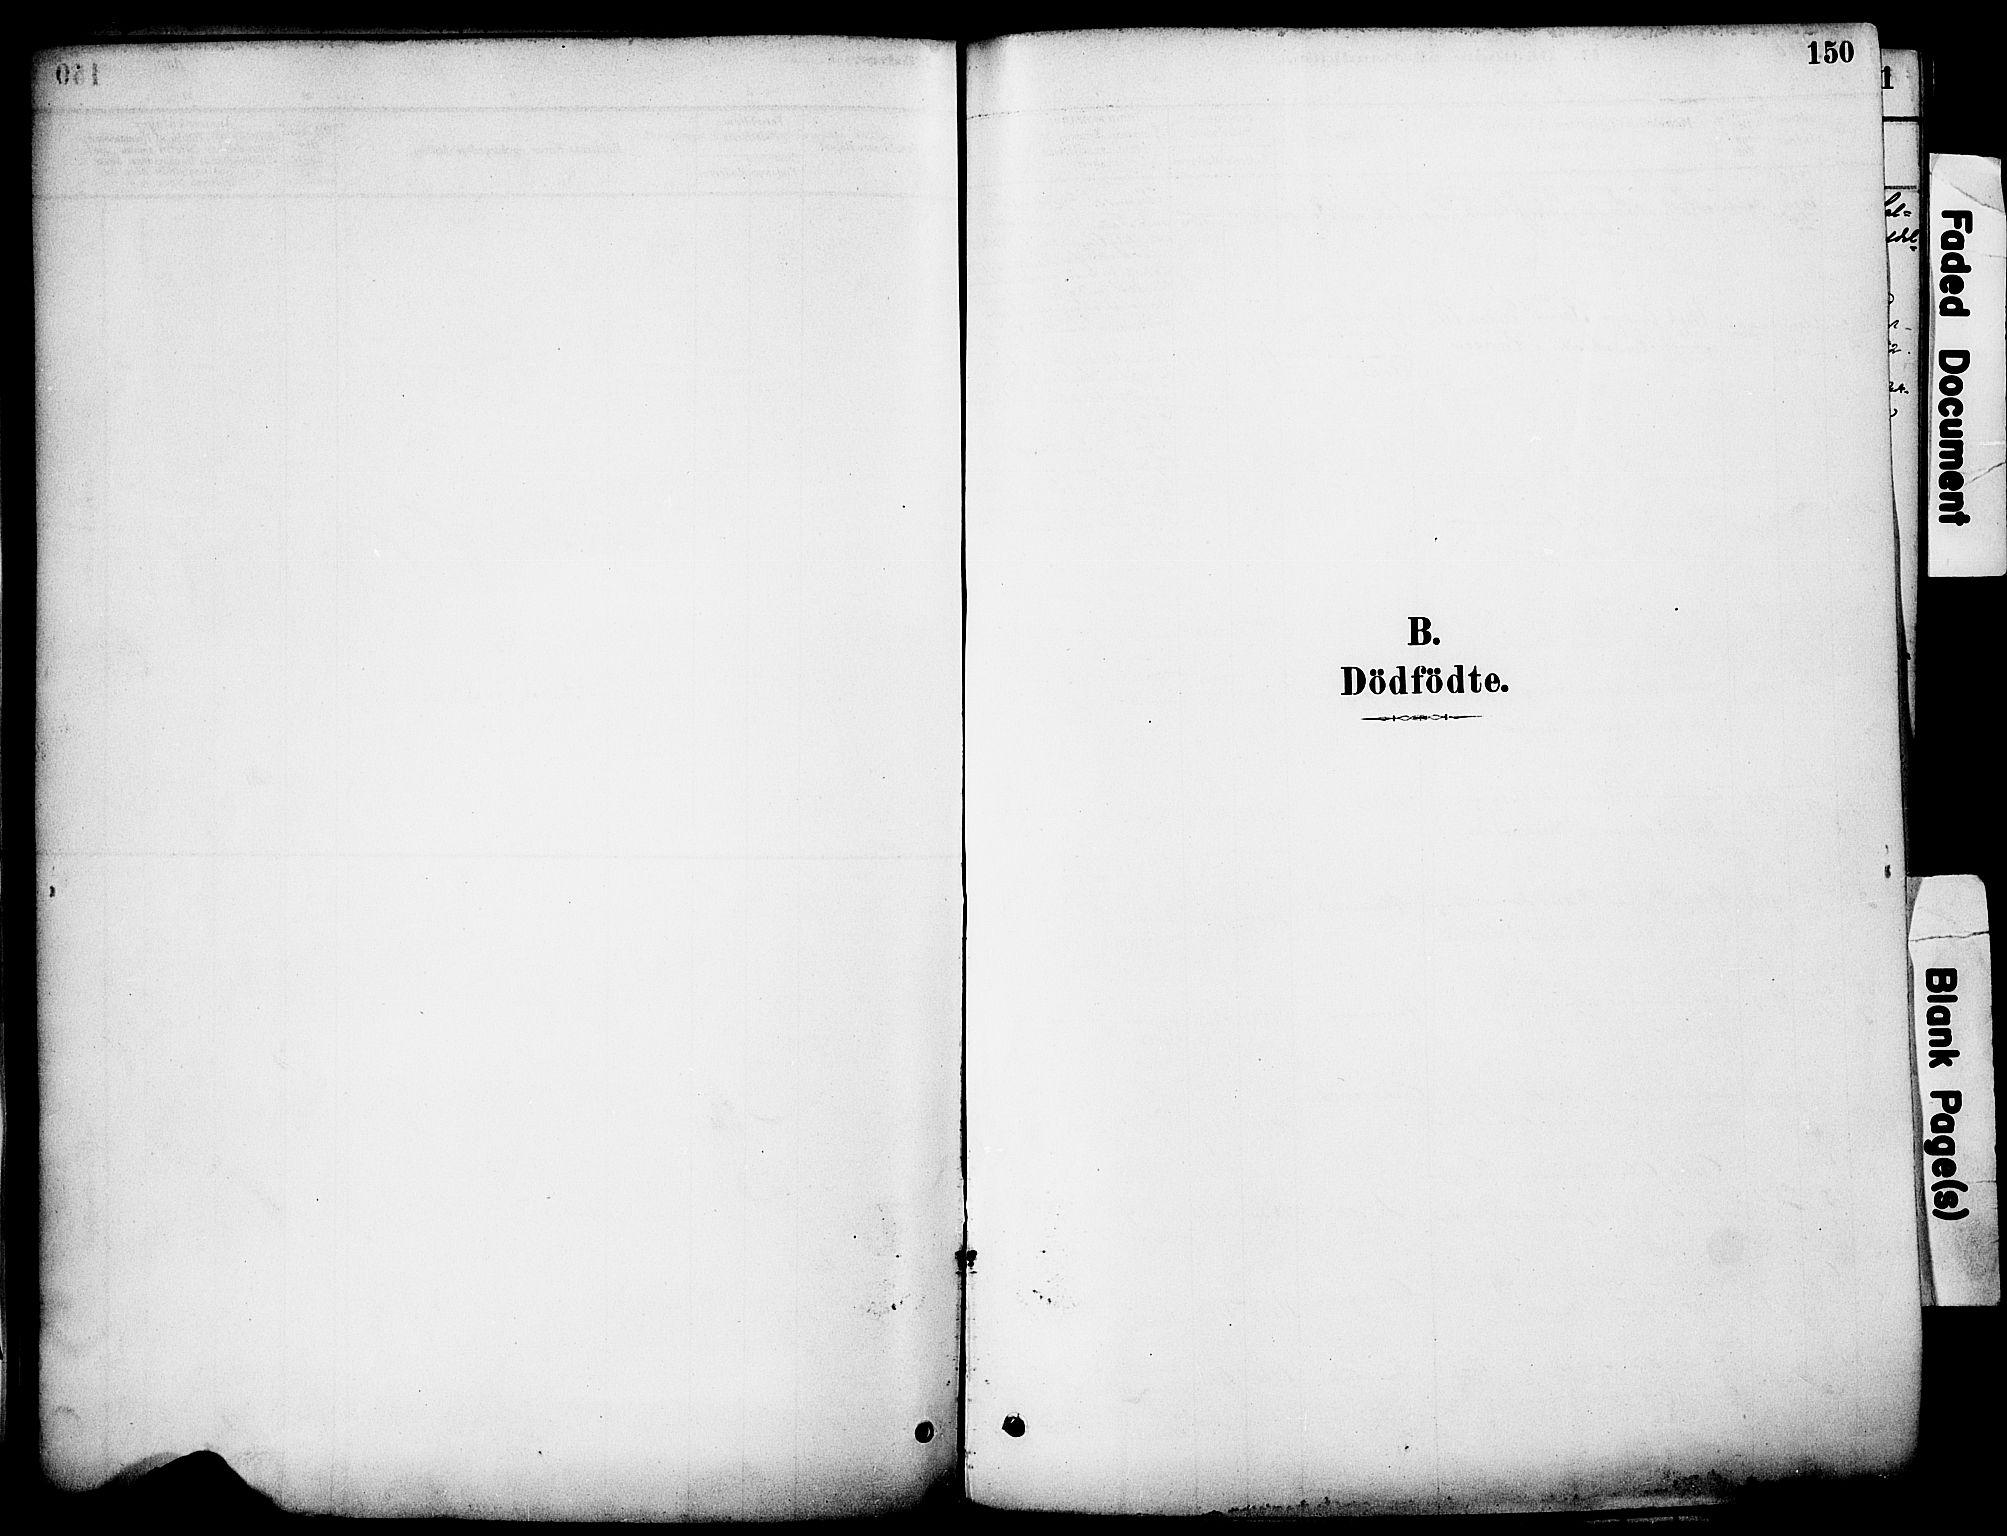 SAH, Stange prestekontor, K/L0017: Ministerialbok nr. 17, 1880-1893, s. 150